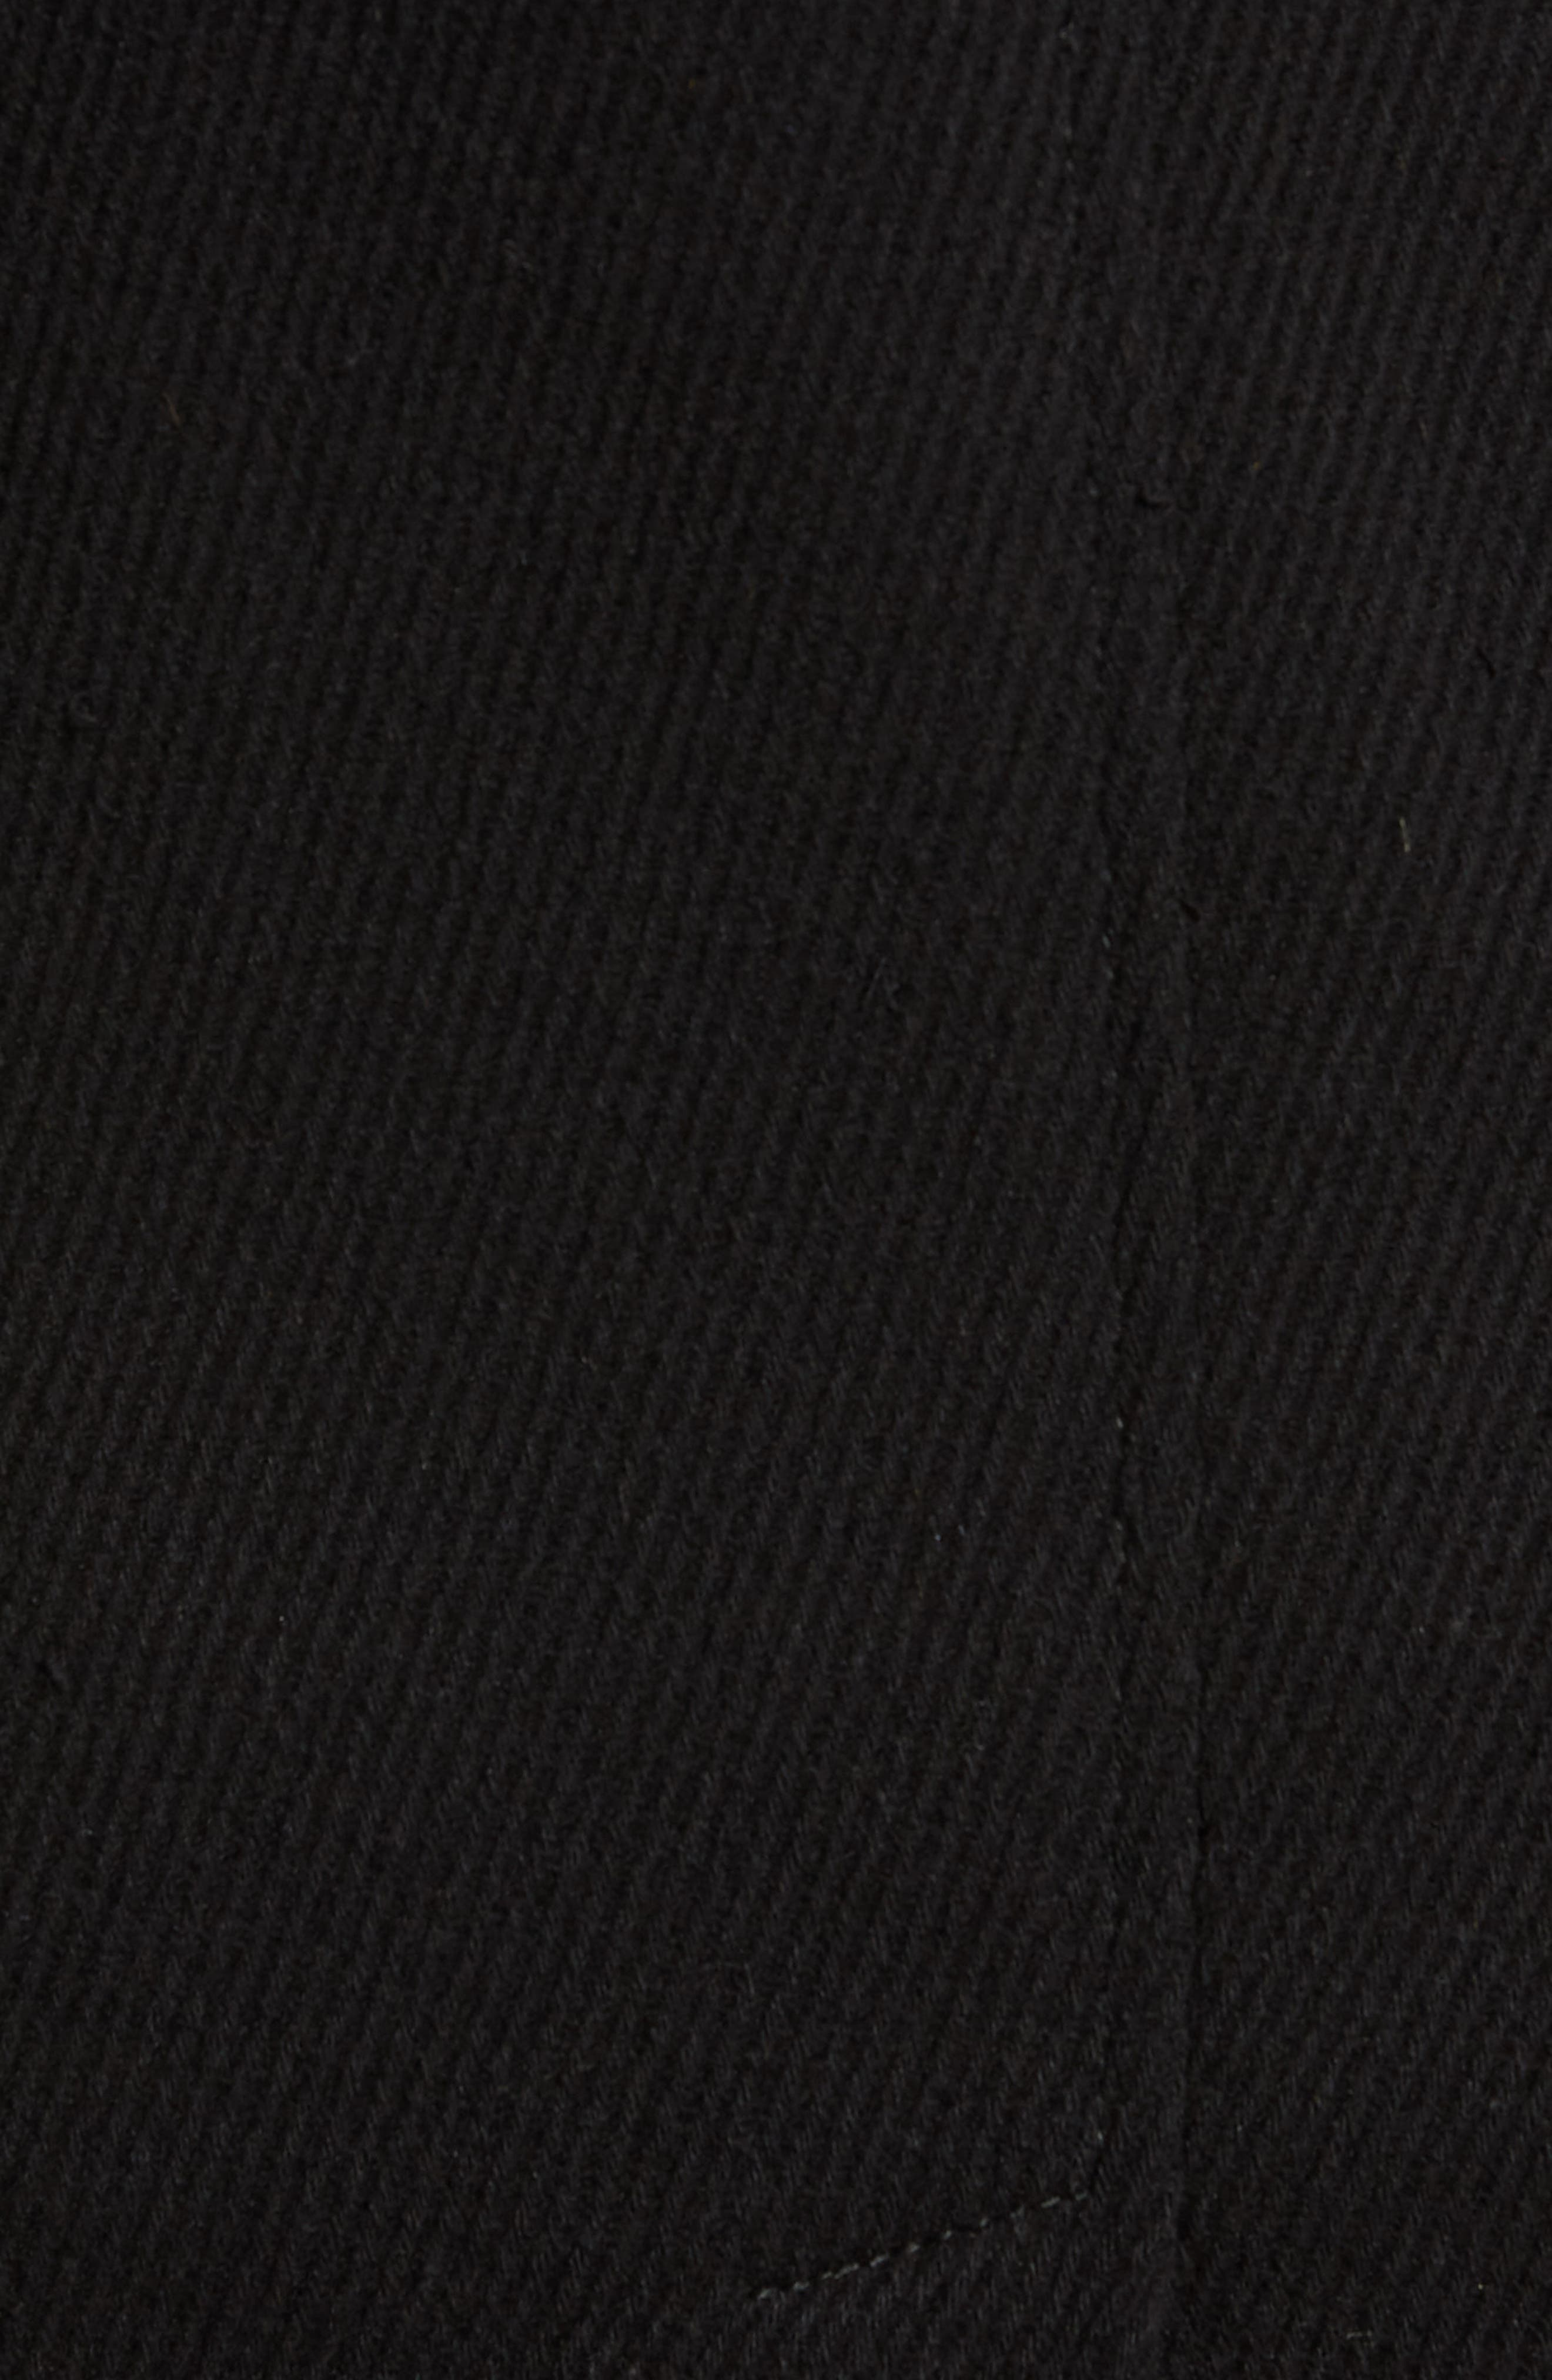 MARC NEW YORK, Edmund Wool Blend Twill Car Coat, Alternate thumbnail 6, color, BLACK